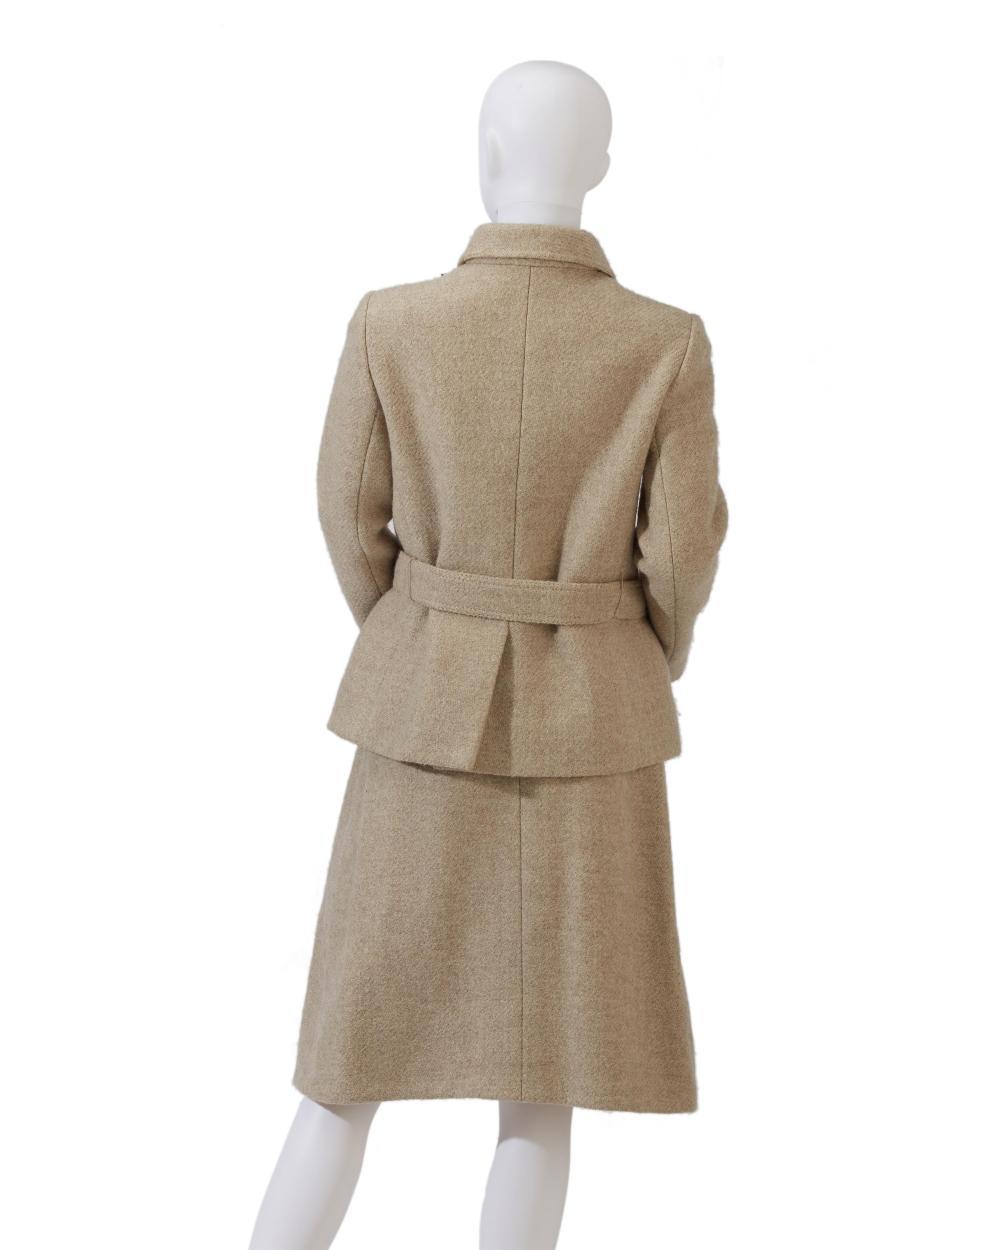 An Hermès skirt suit